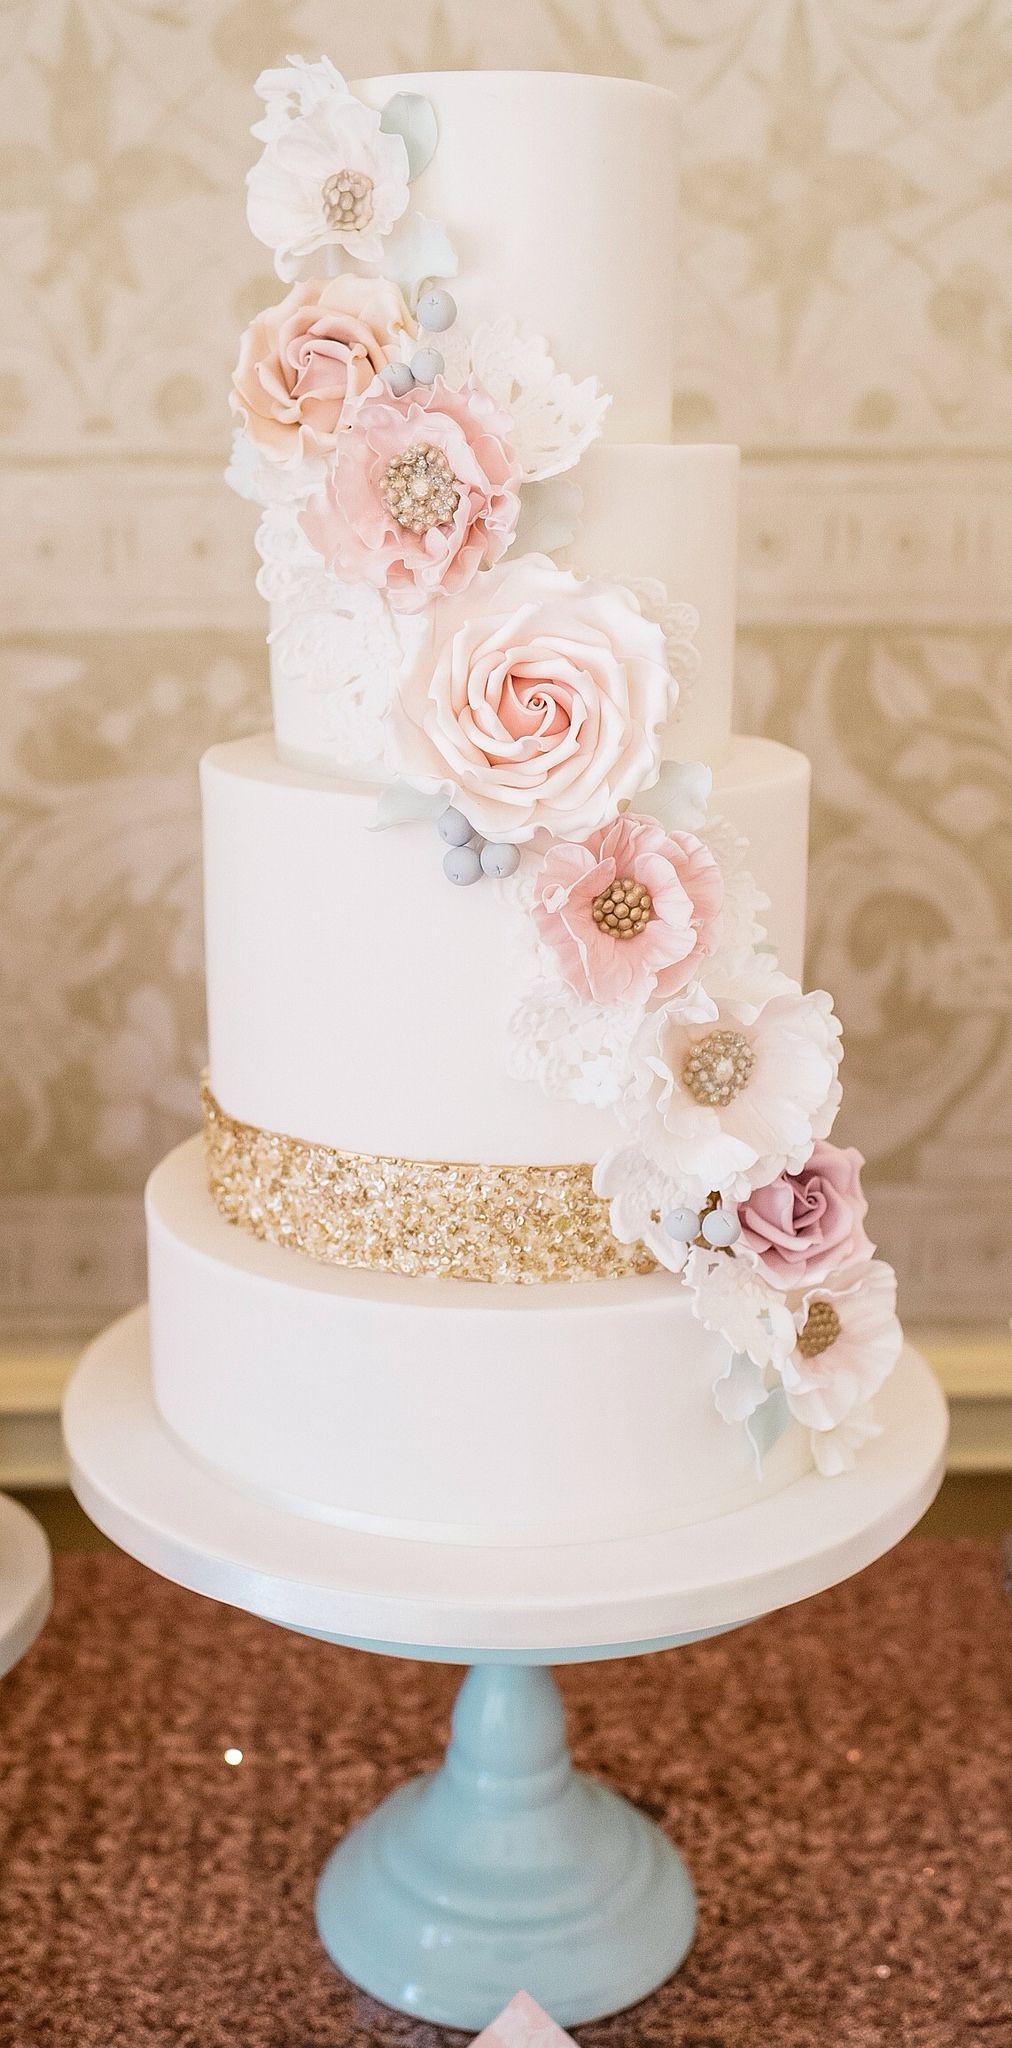 Sequins and flowers cake wedding cakes pinterest wedding